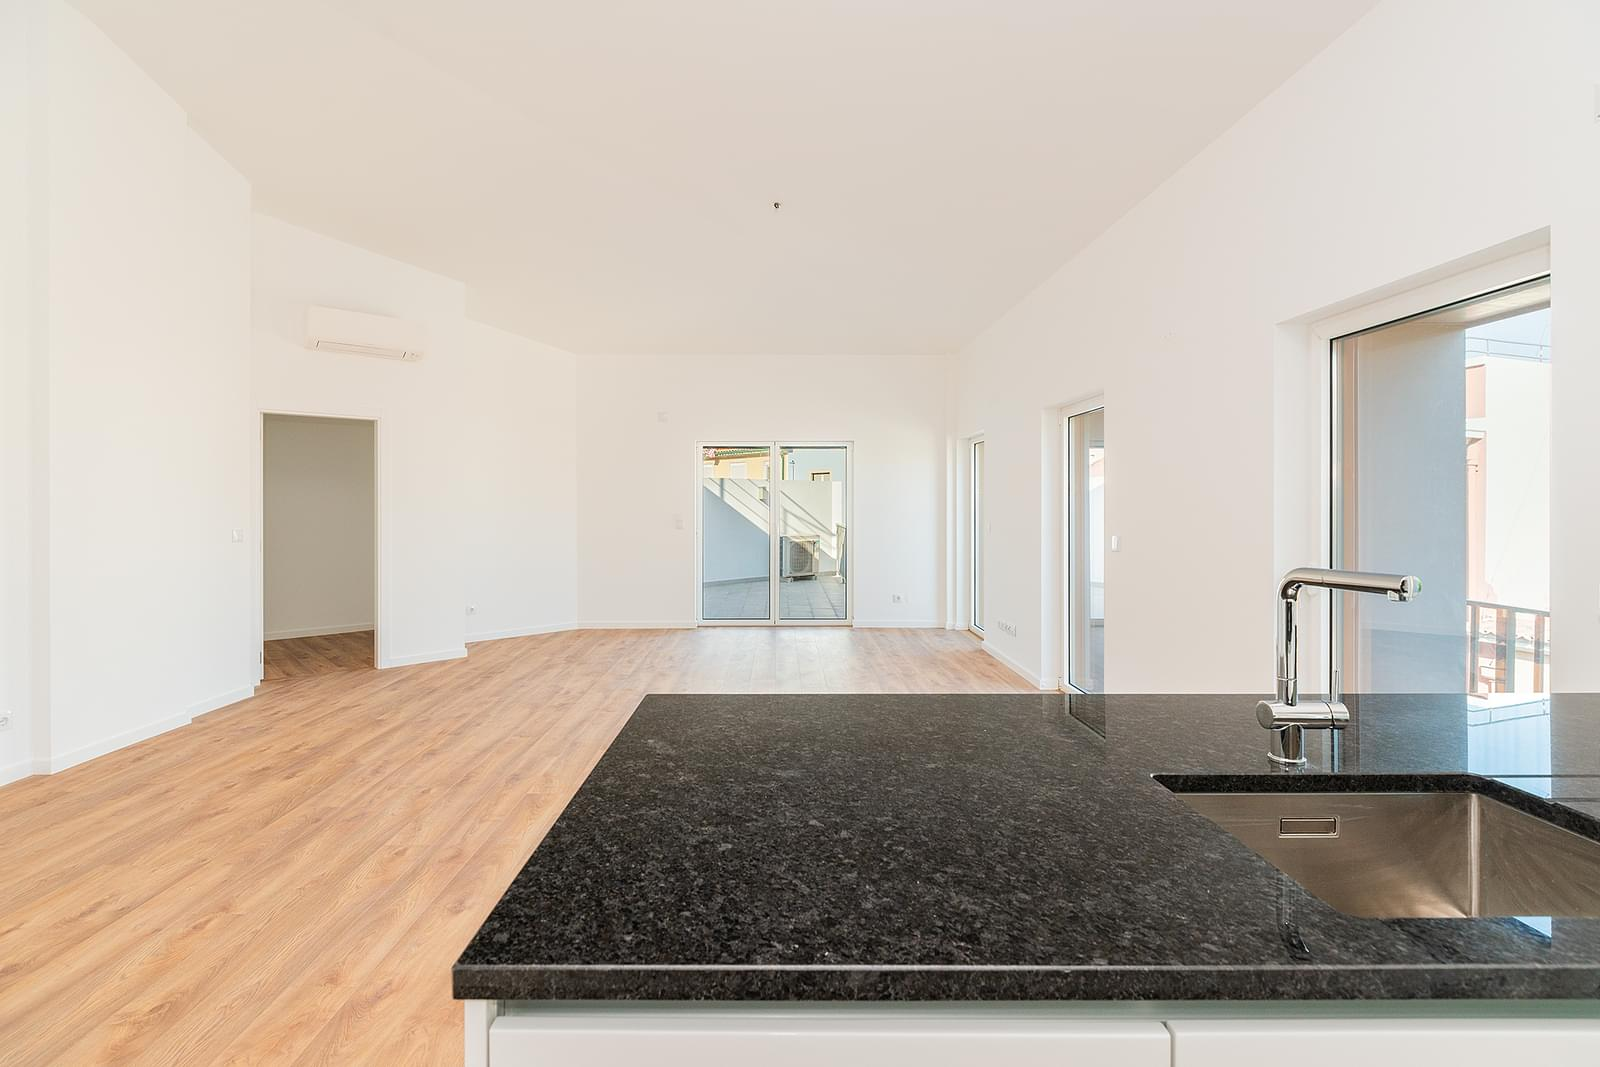 pf18413-apartamento-t1-lisboa-57ee2bee-2657-4170-9235-69250e2eb0cd